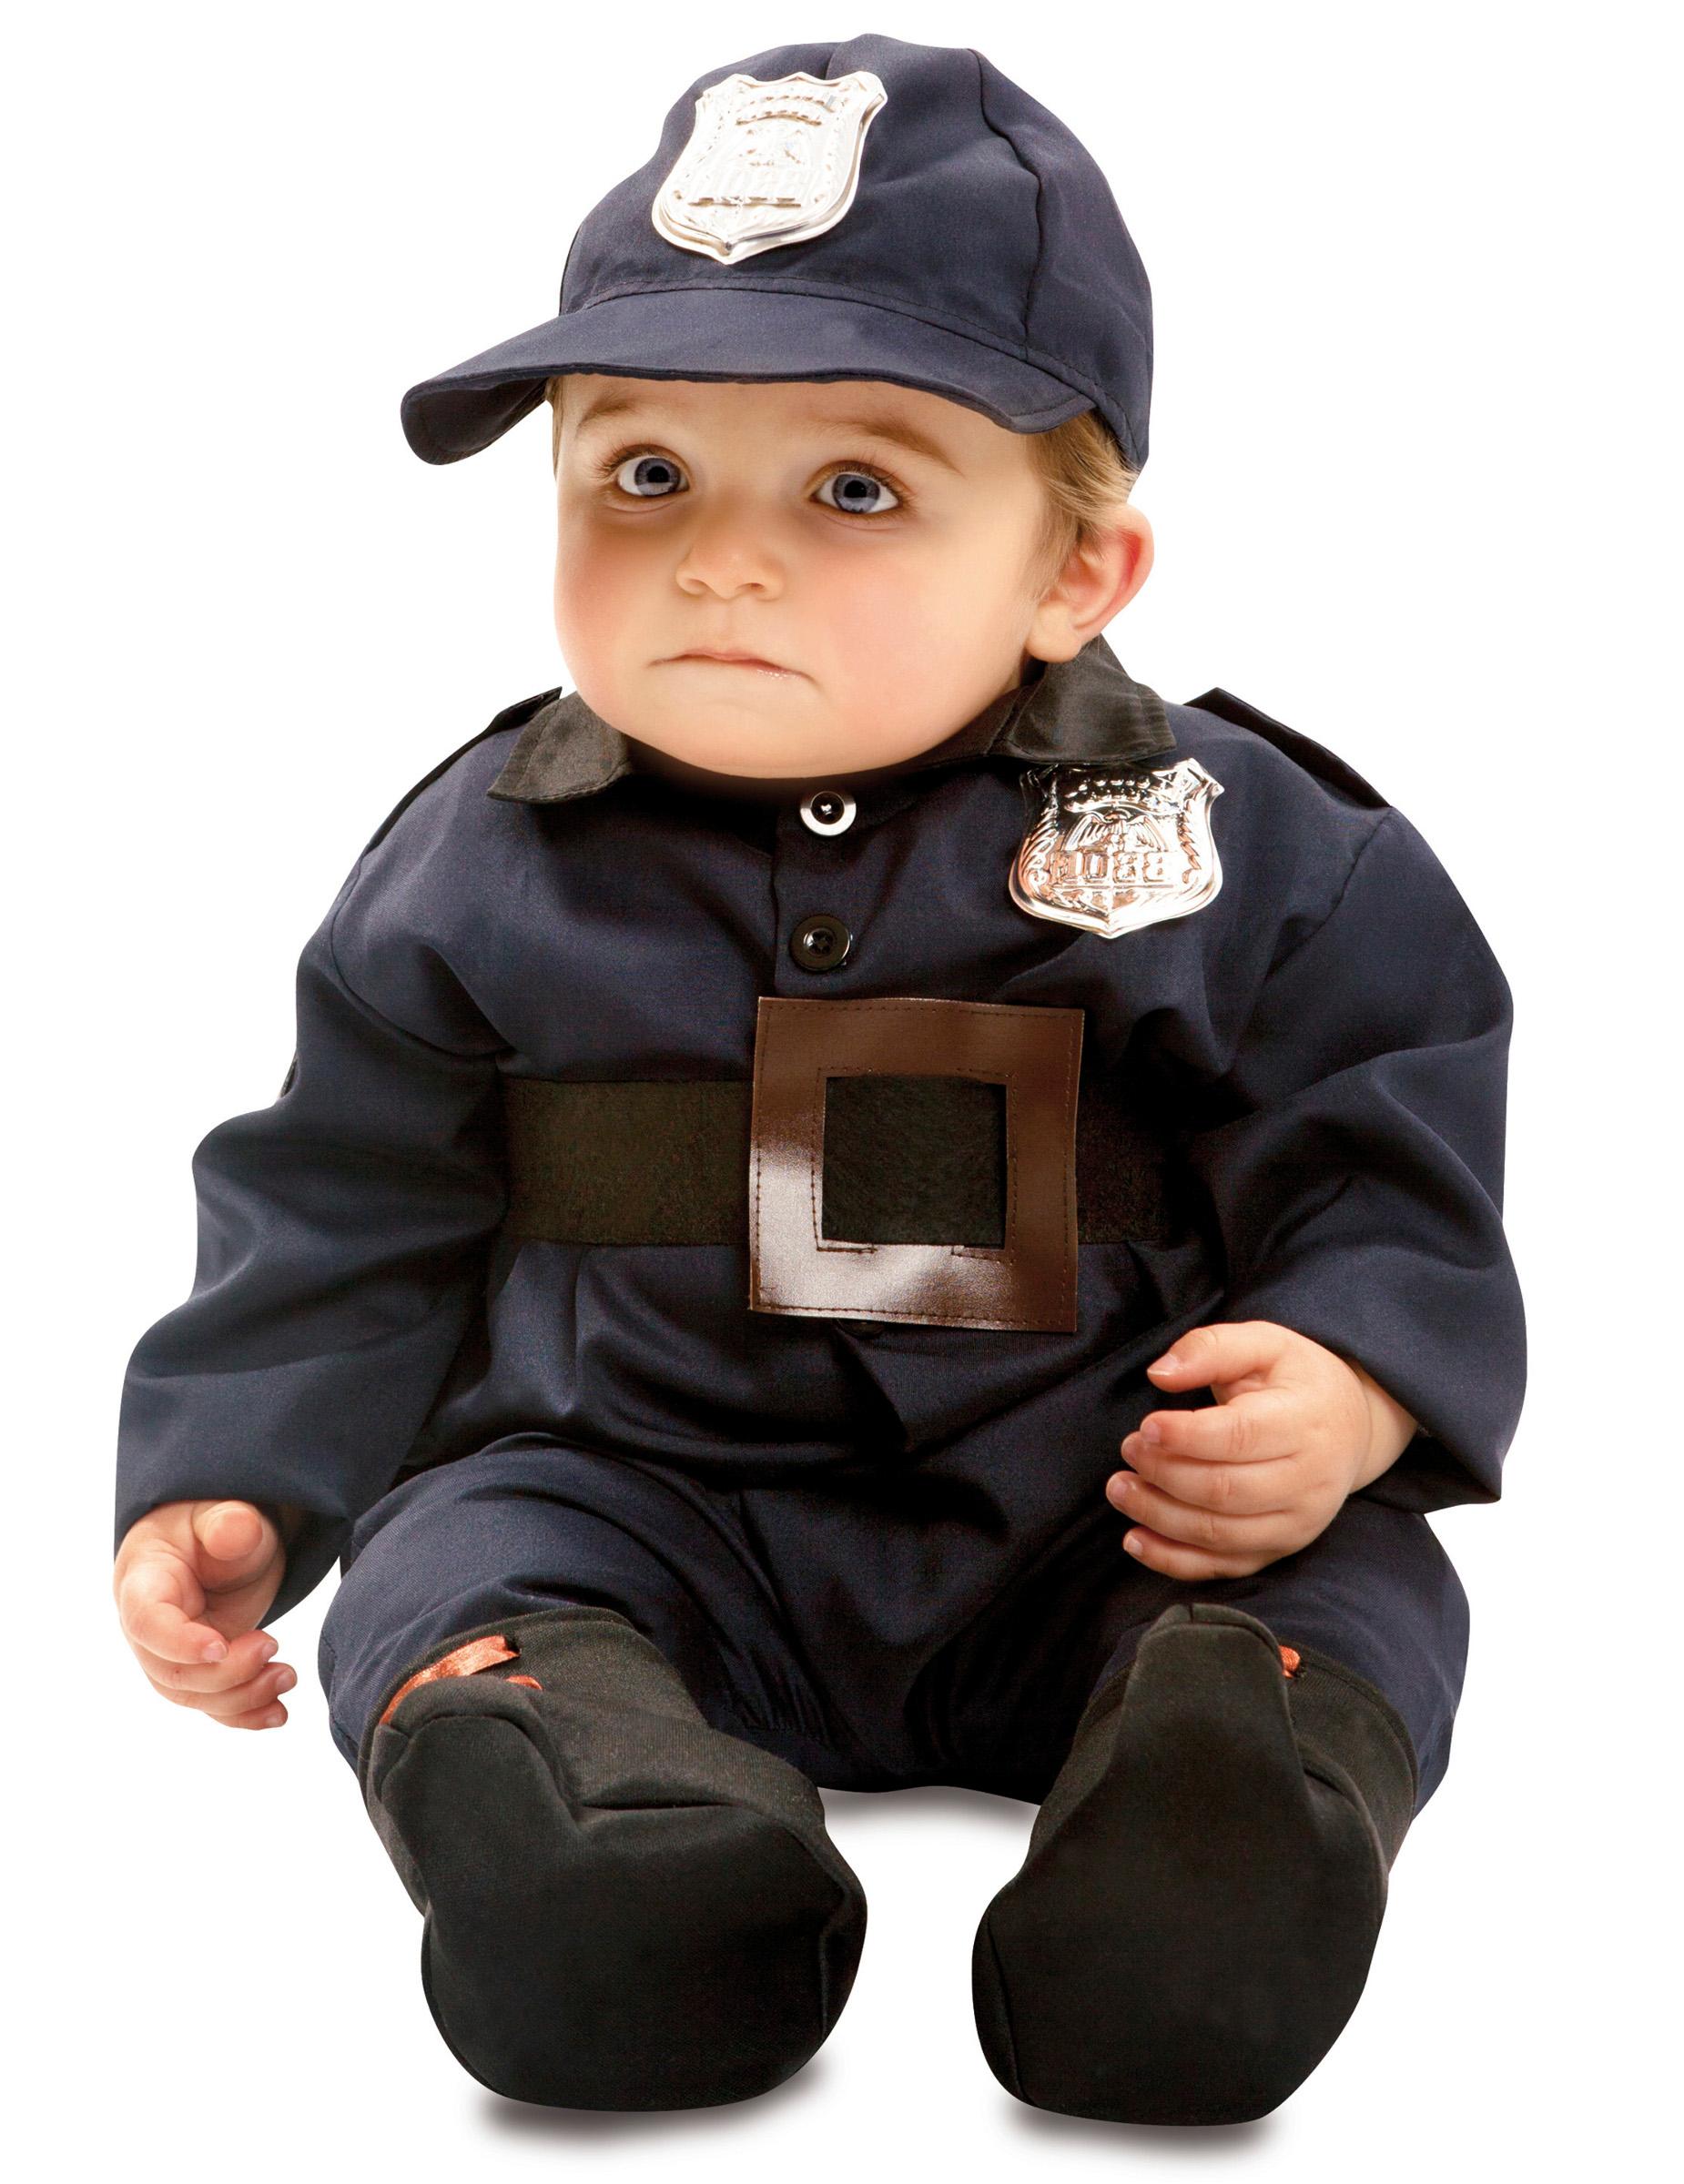 Kostum Polizist Fur Babys Gunstige Faschings Kostume Bei Karneval